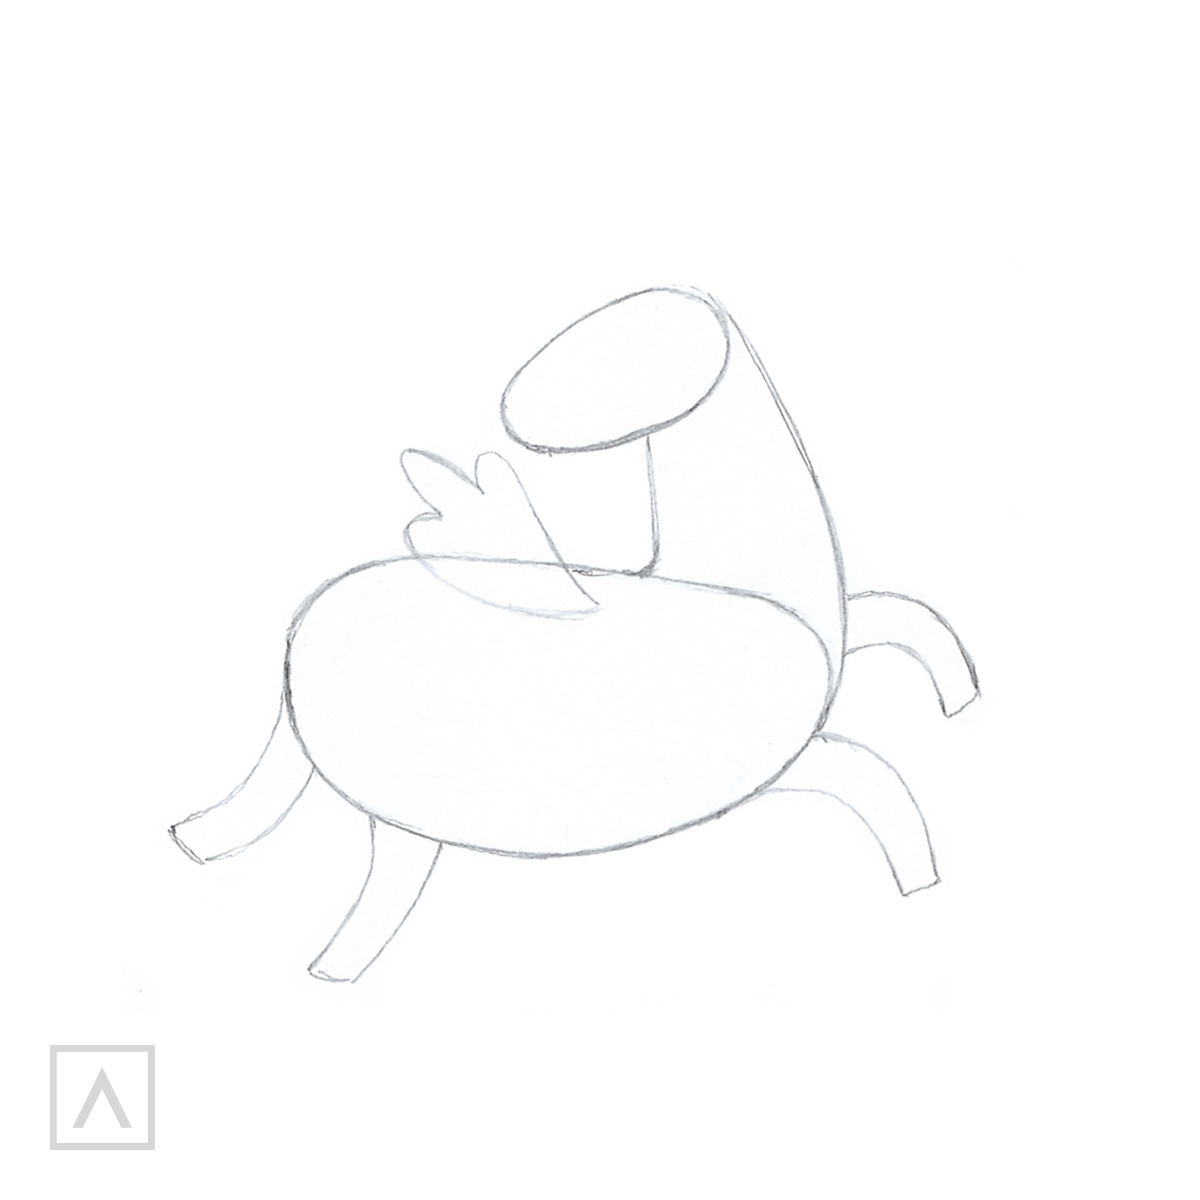 How to Draw a Unicorn - Step 2